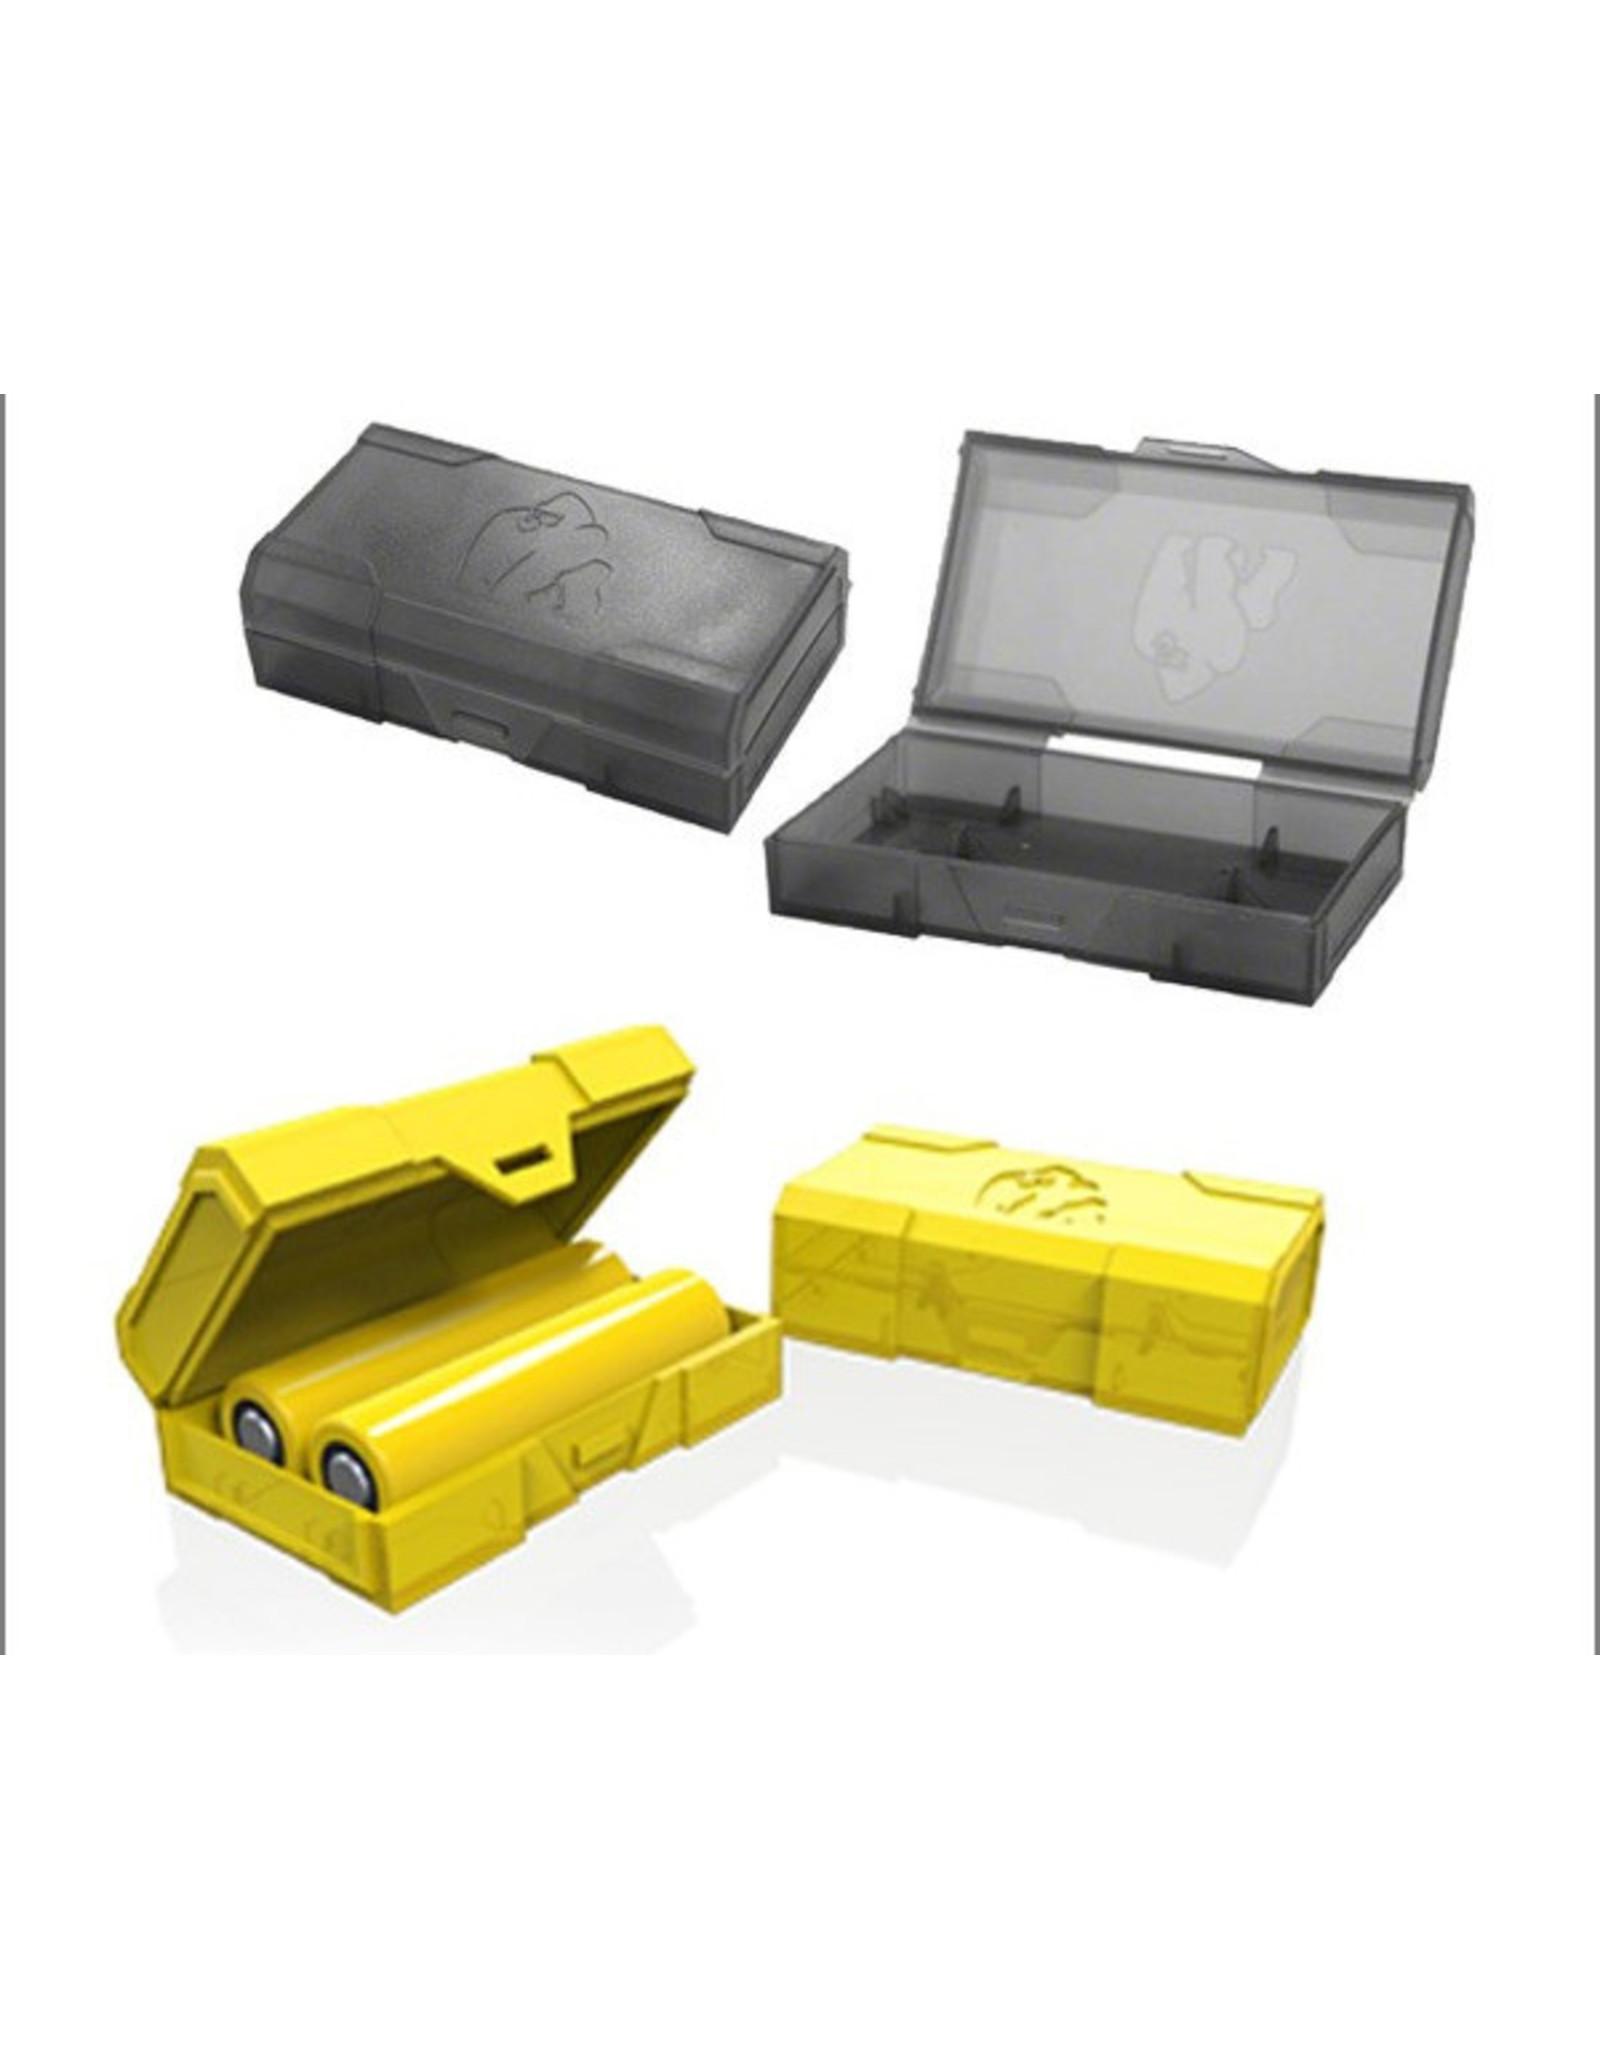 Chubby Gorilla Chubby Gorilla Dual Battery Case